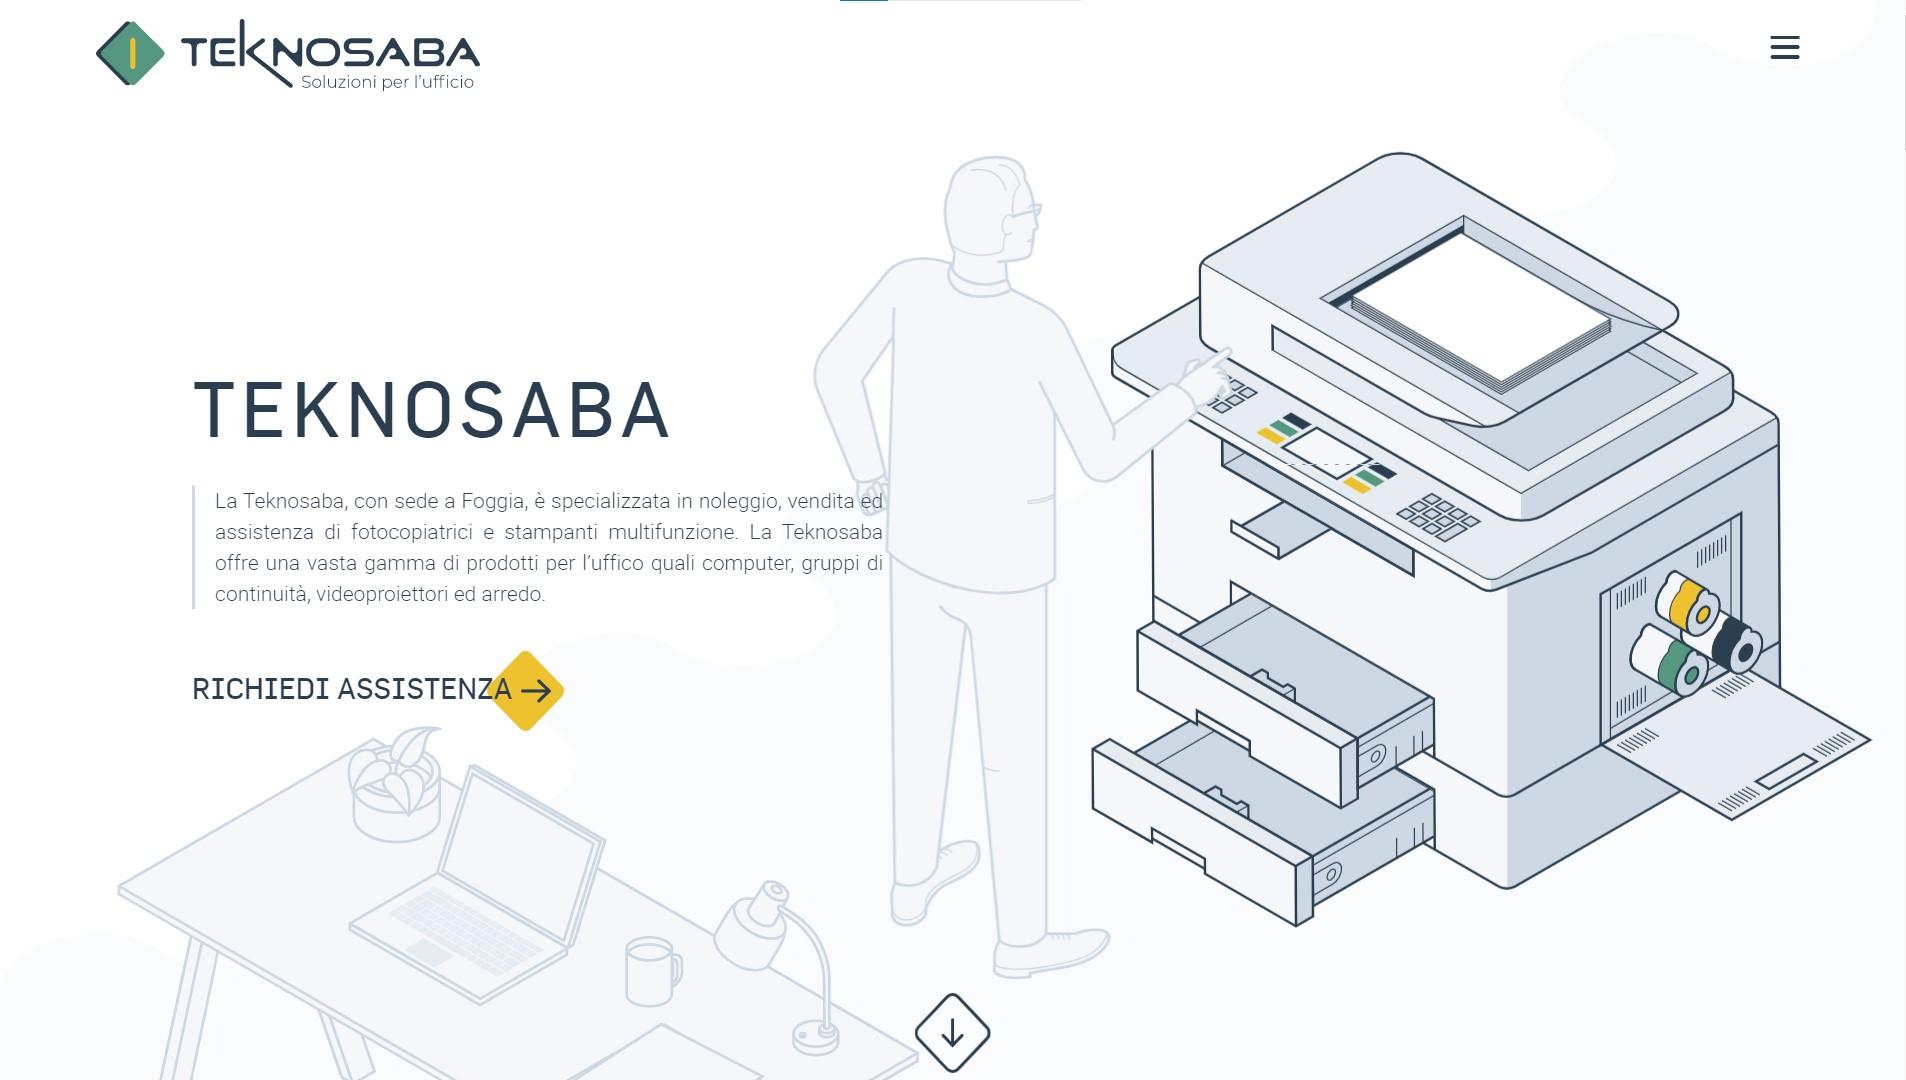 Orpetron Web Design Awards - Teknosaba - Web Design Awards Inspiration Trends UI UX